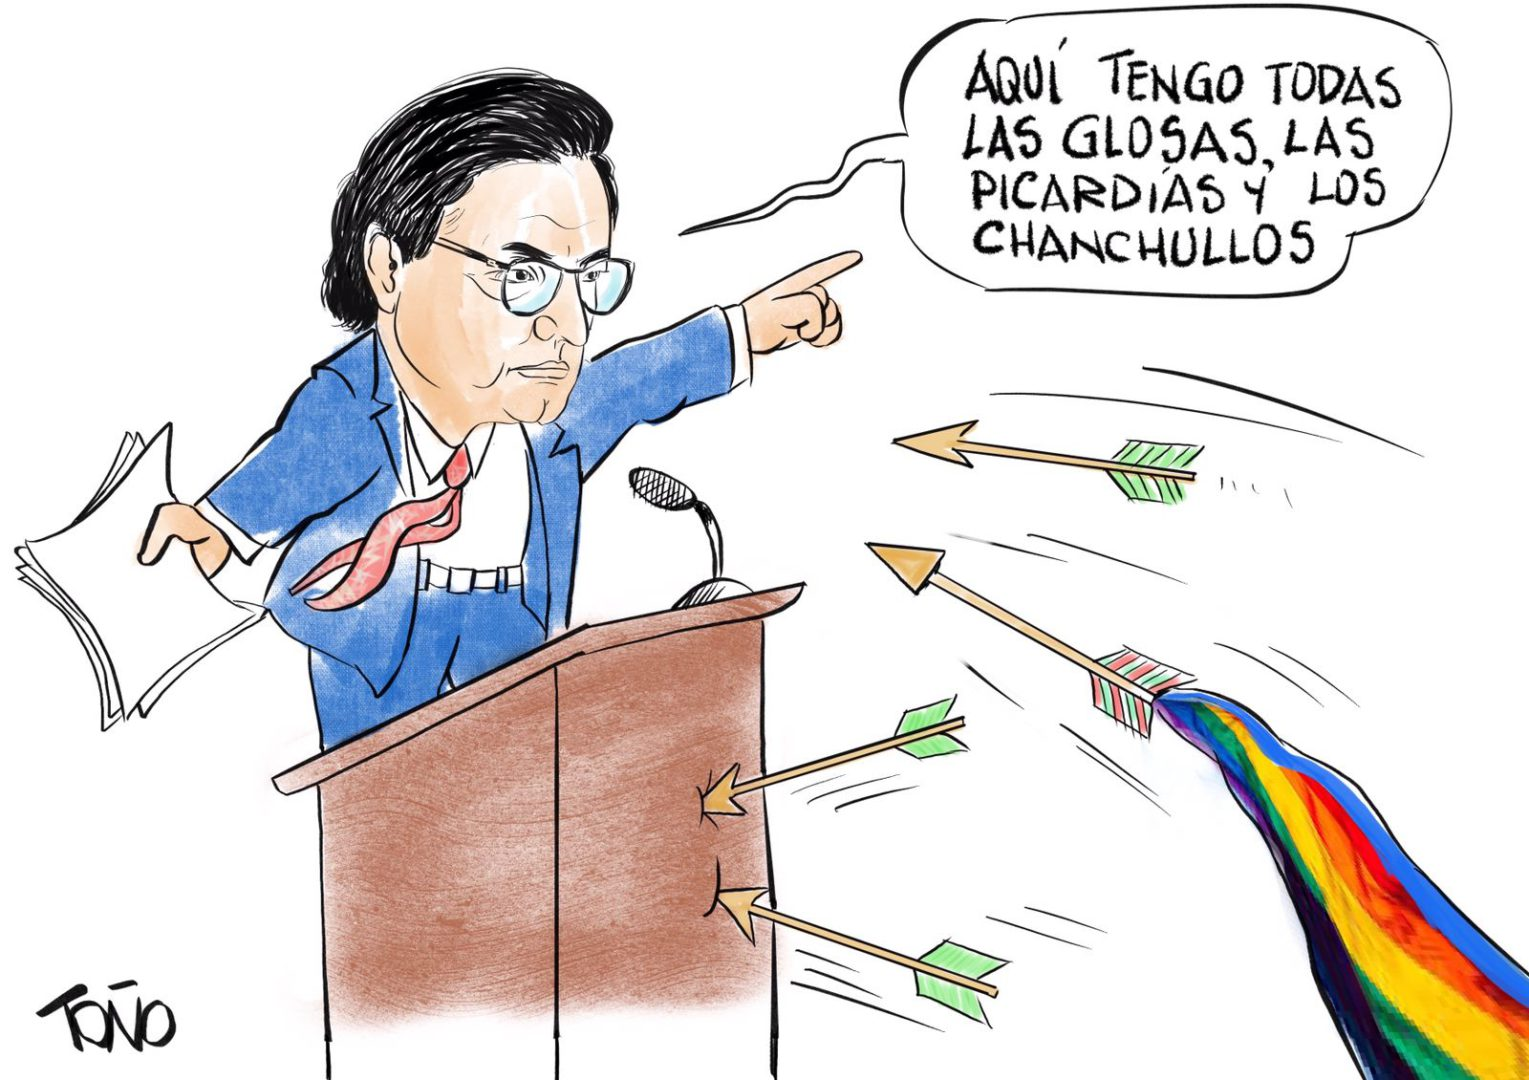 Ataques a Villavicencio